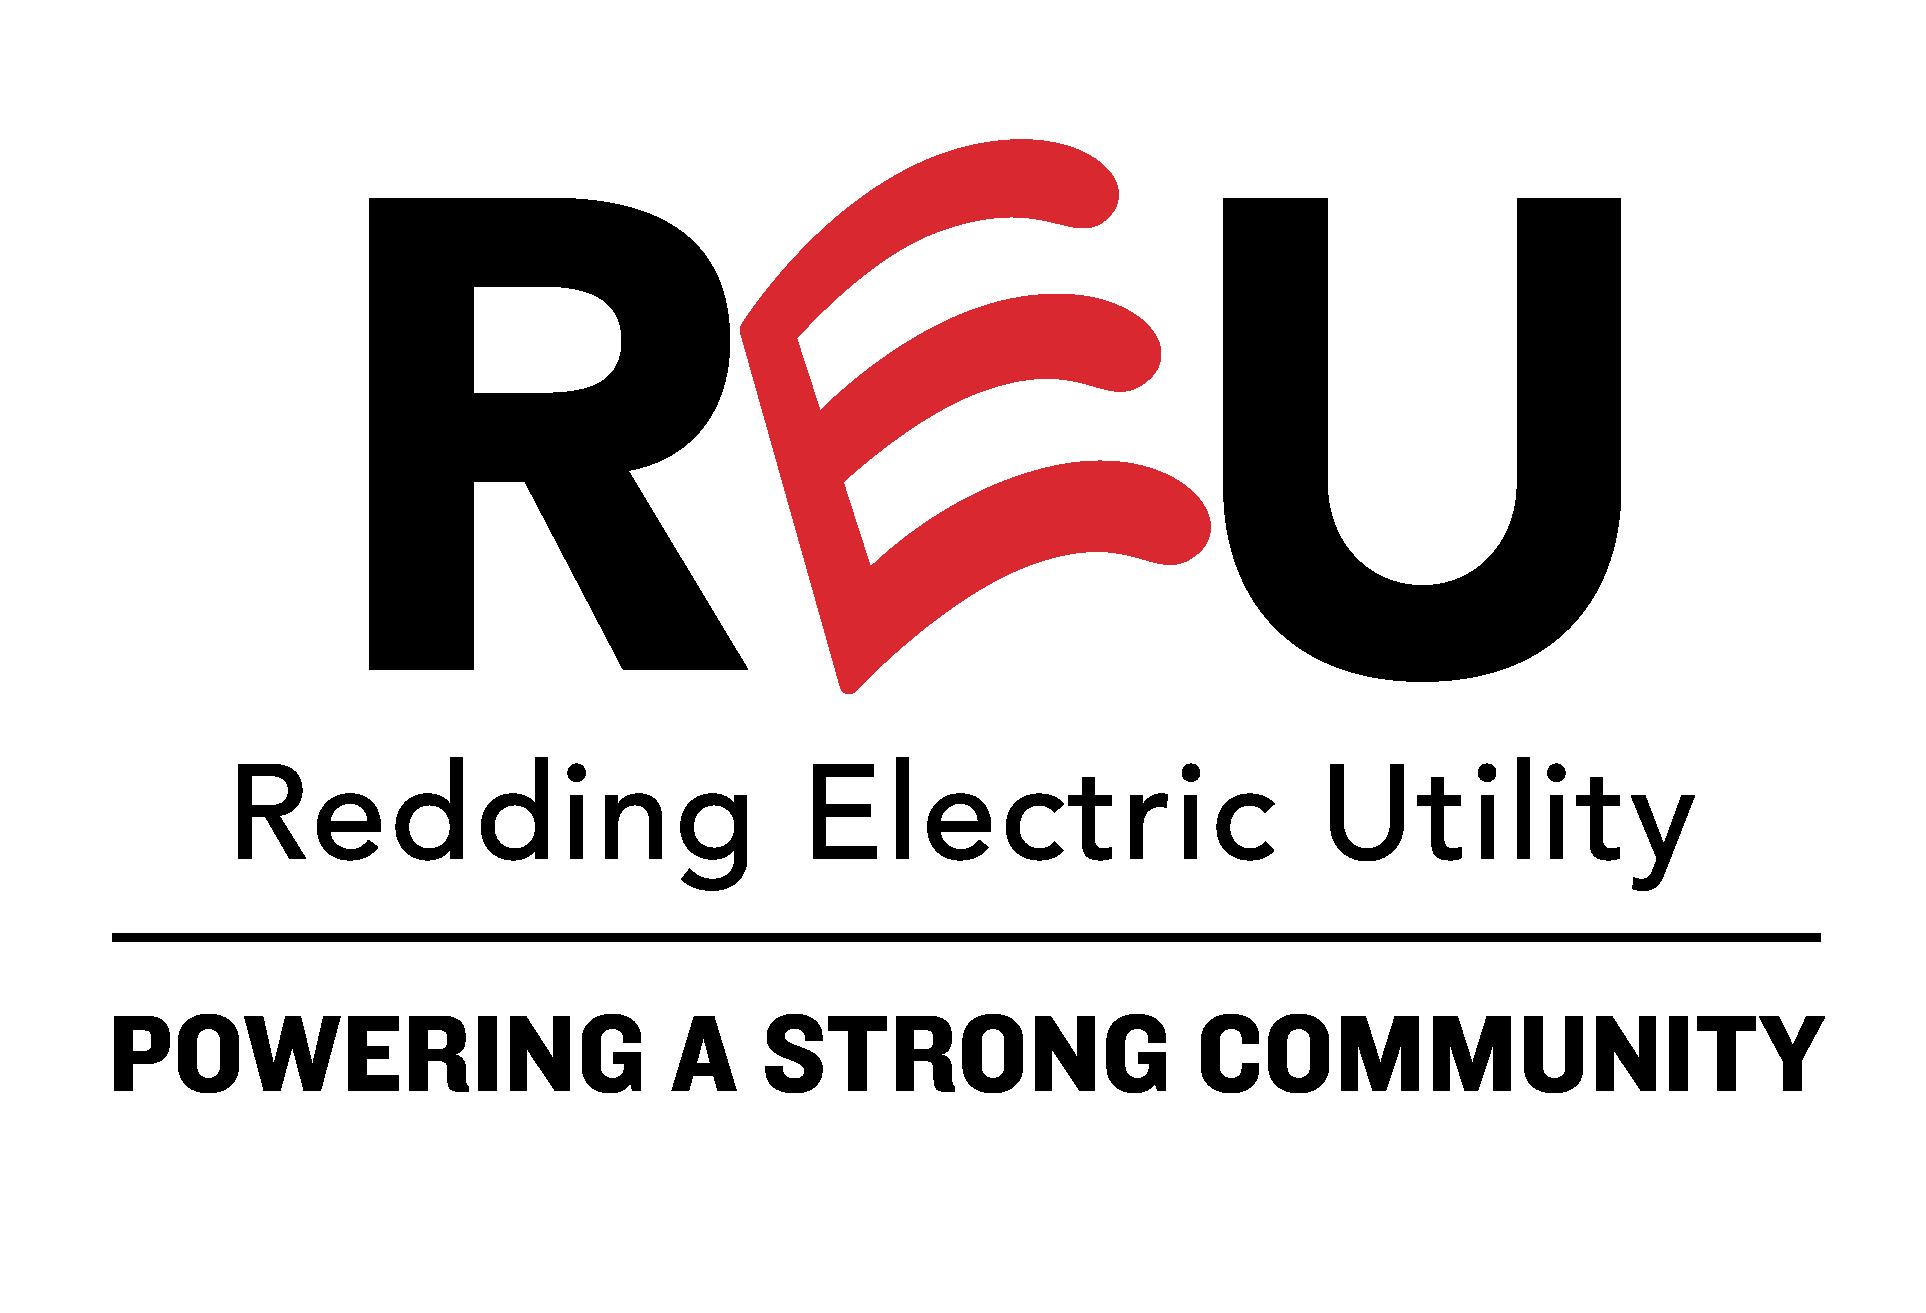 REU: Redding Electric Utility Logo: powering a strong community